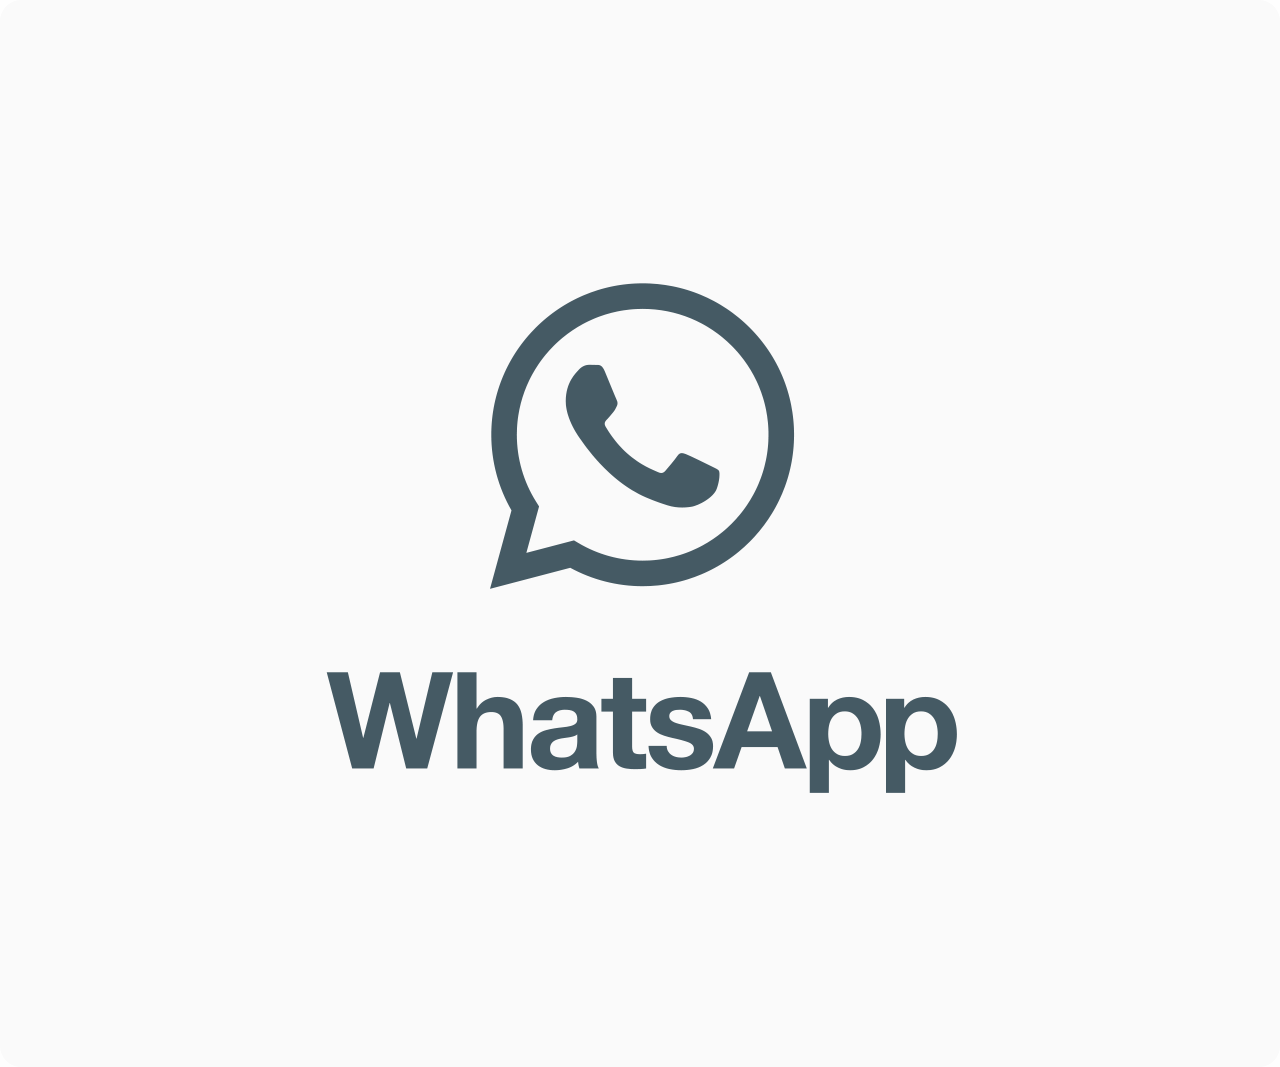 WhatsApp icon with wordmark